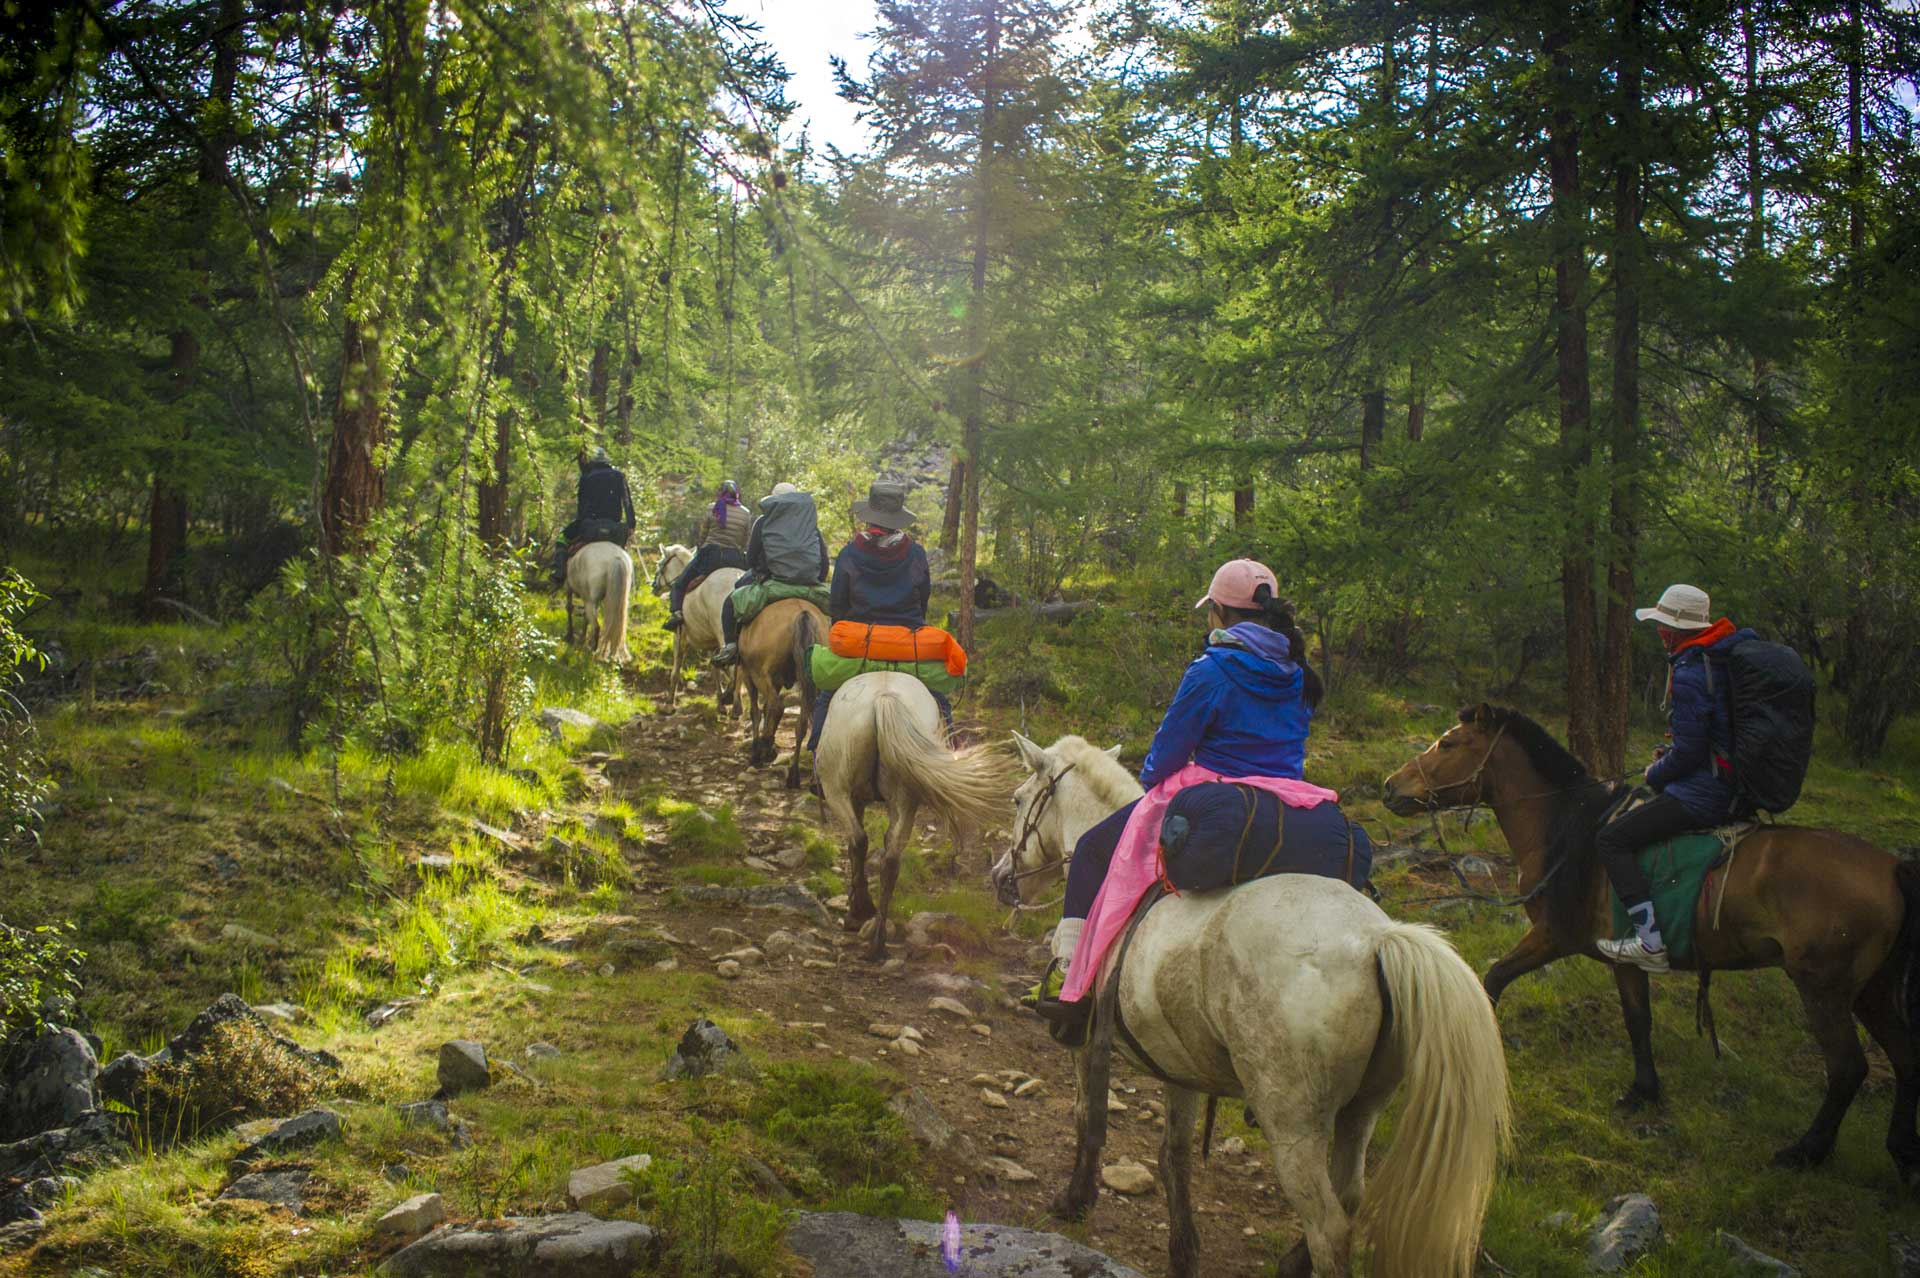 horse-trekking-tour-mongolia